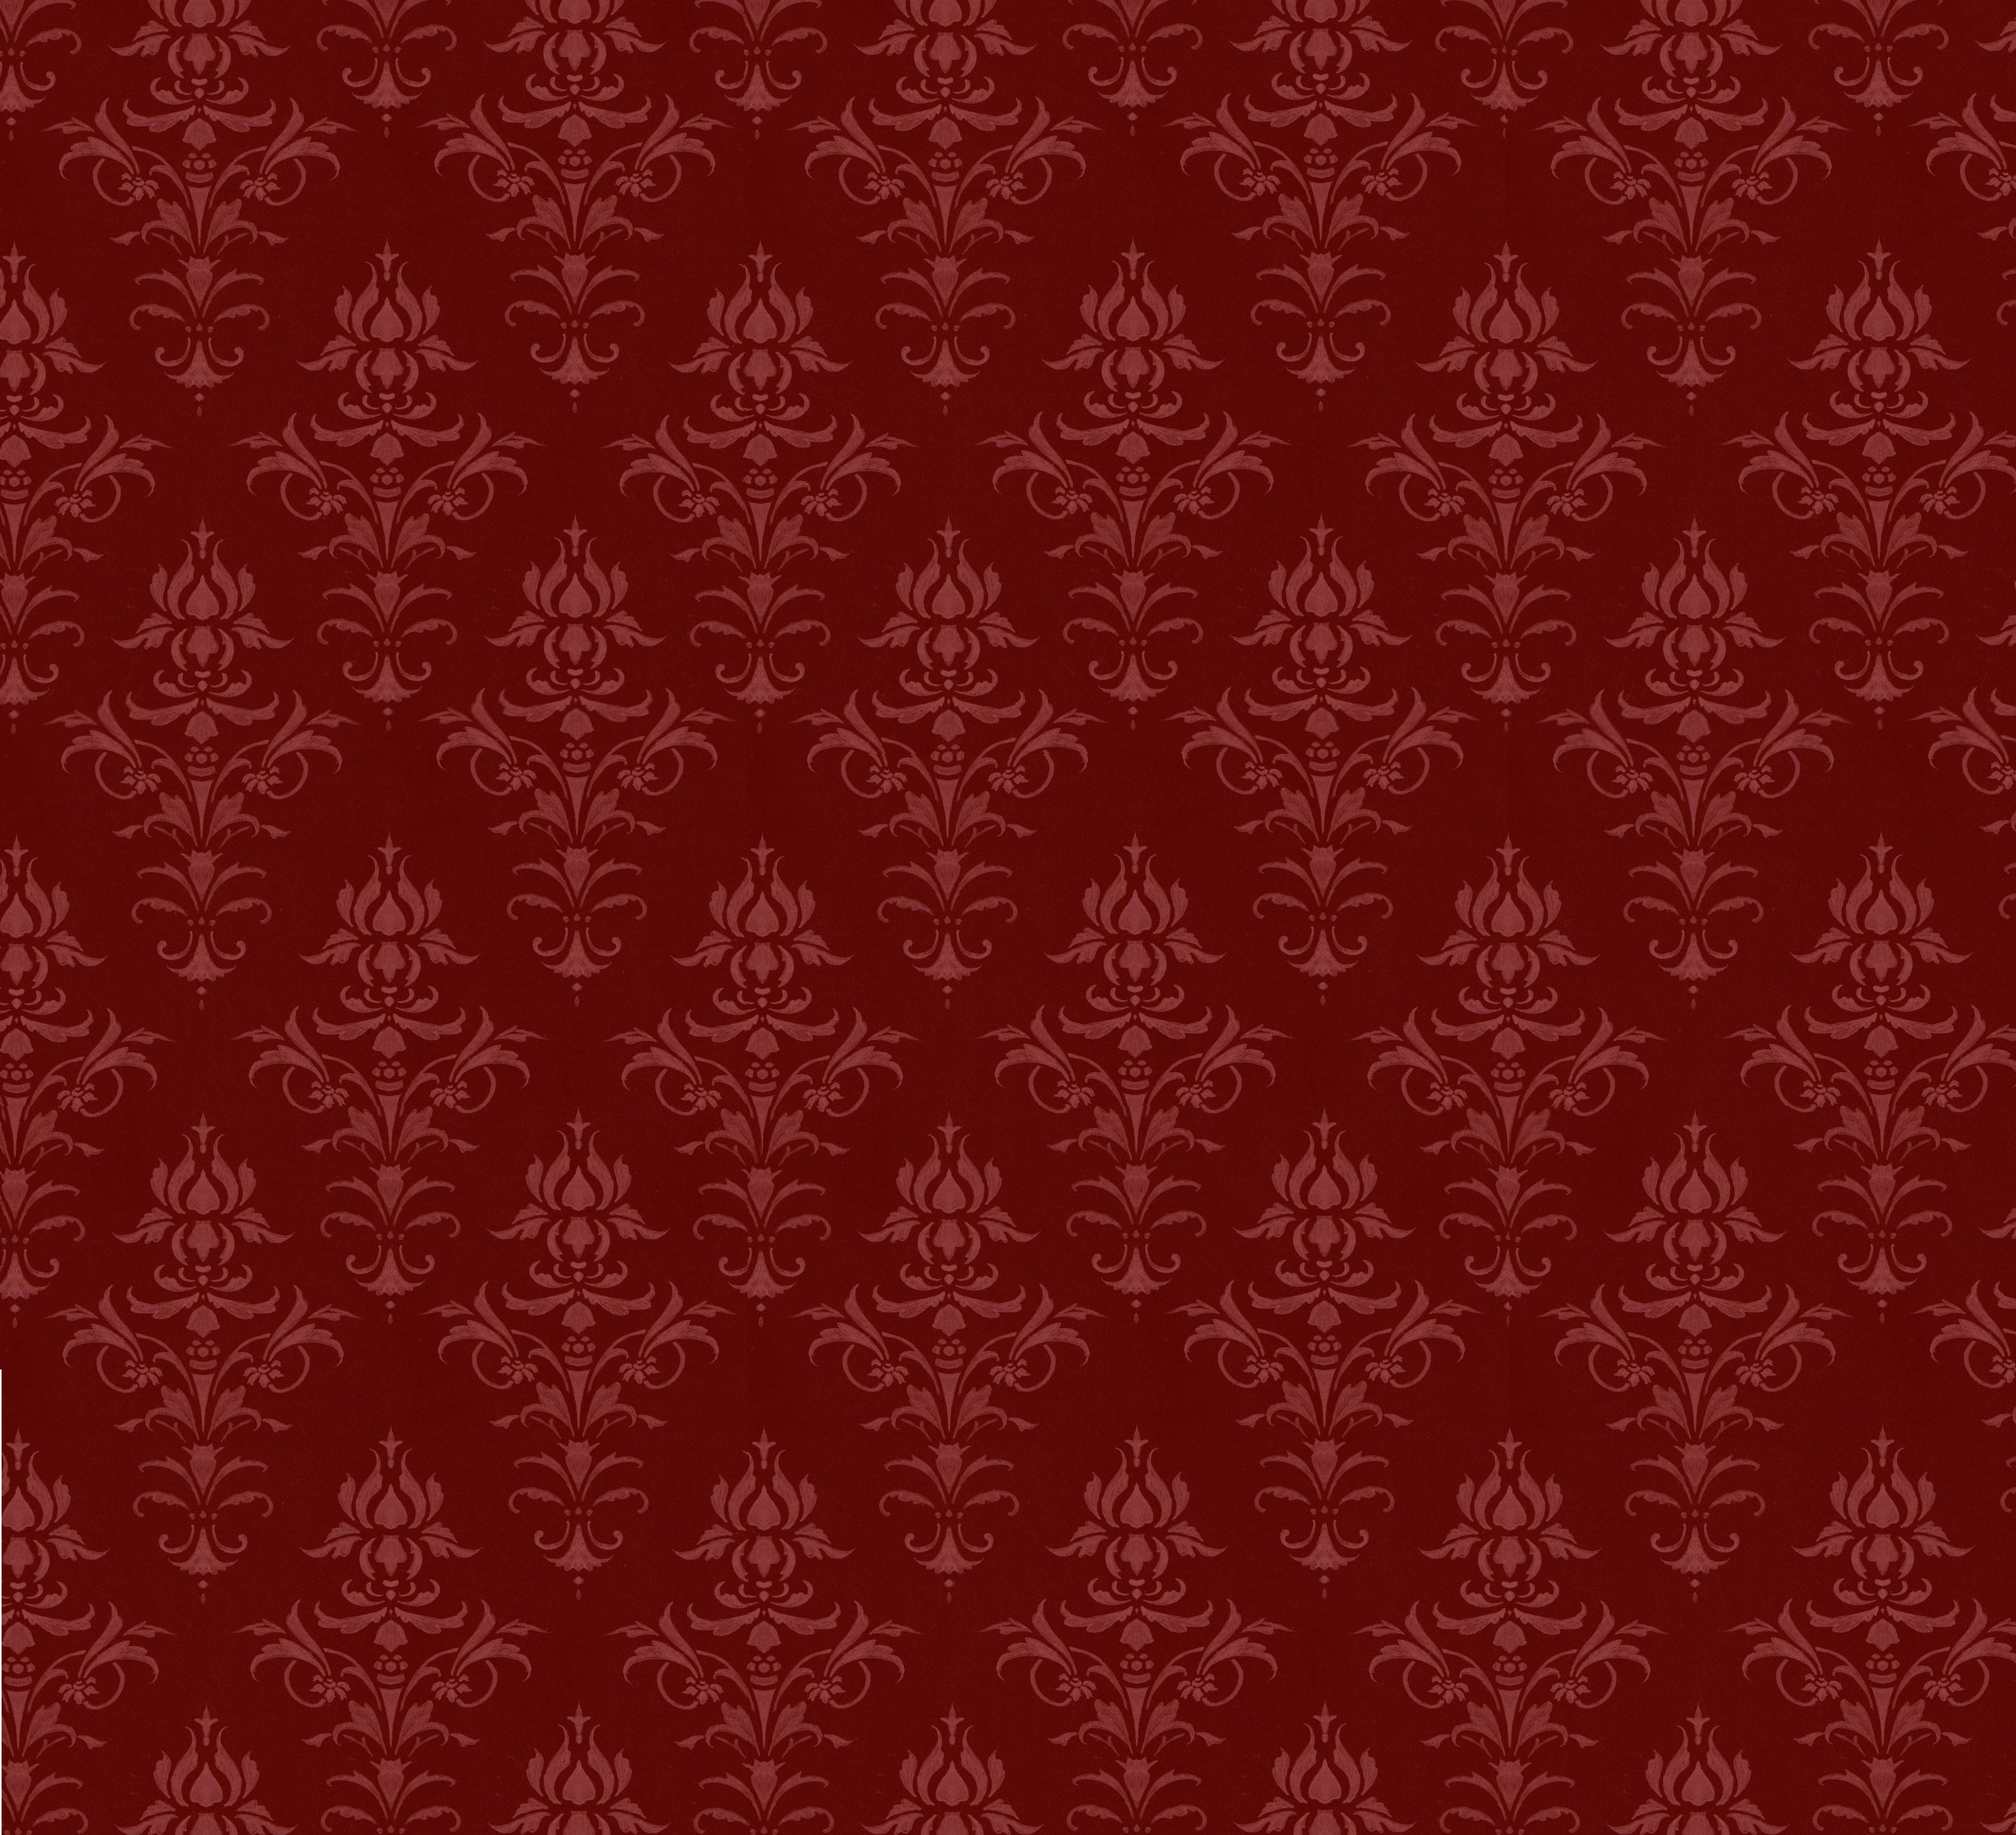 DREAM WALLPAPER Victorian Style Wallpaper 3781x3441